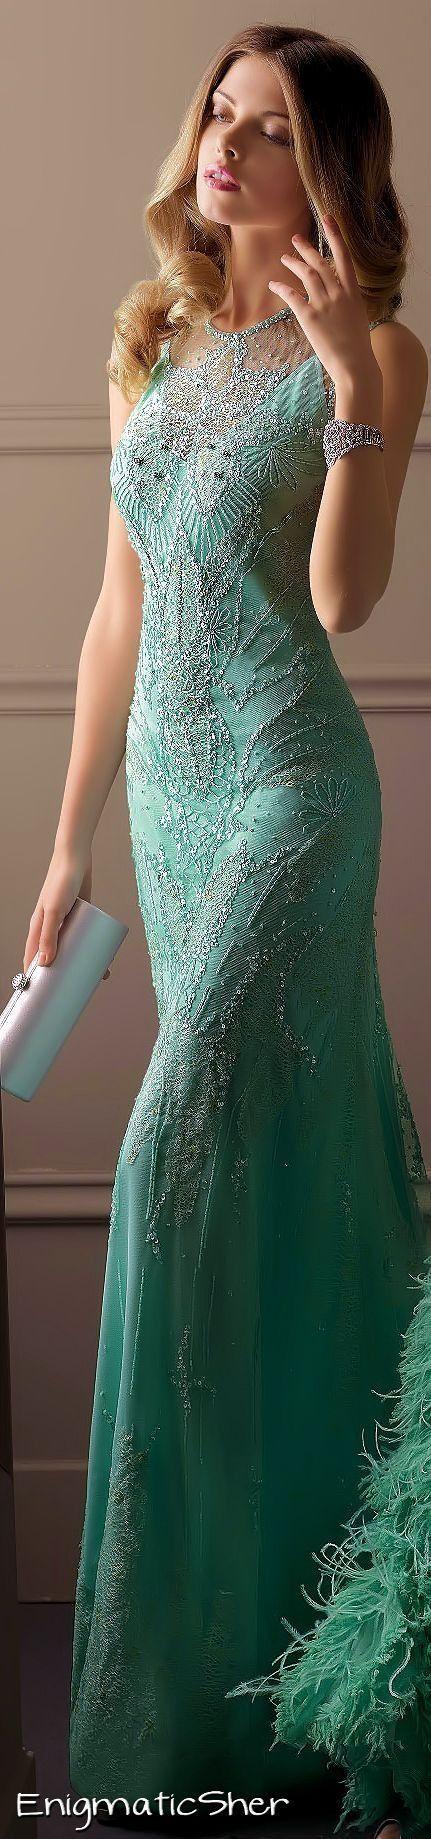 I like the dress. The model looks like she's about to sneeze though...